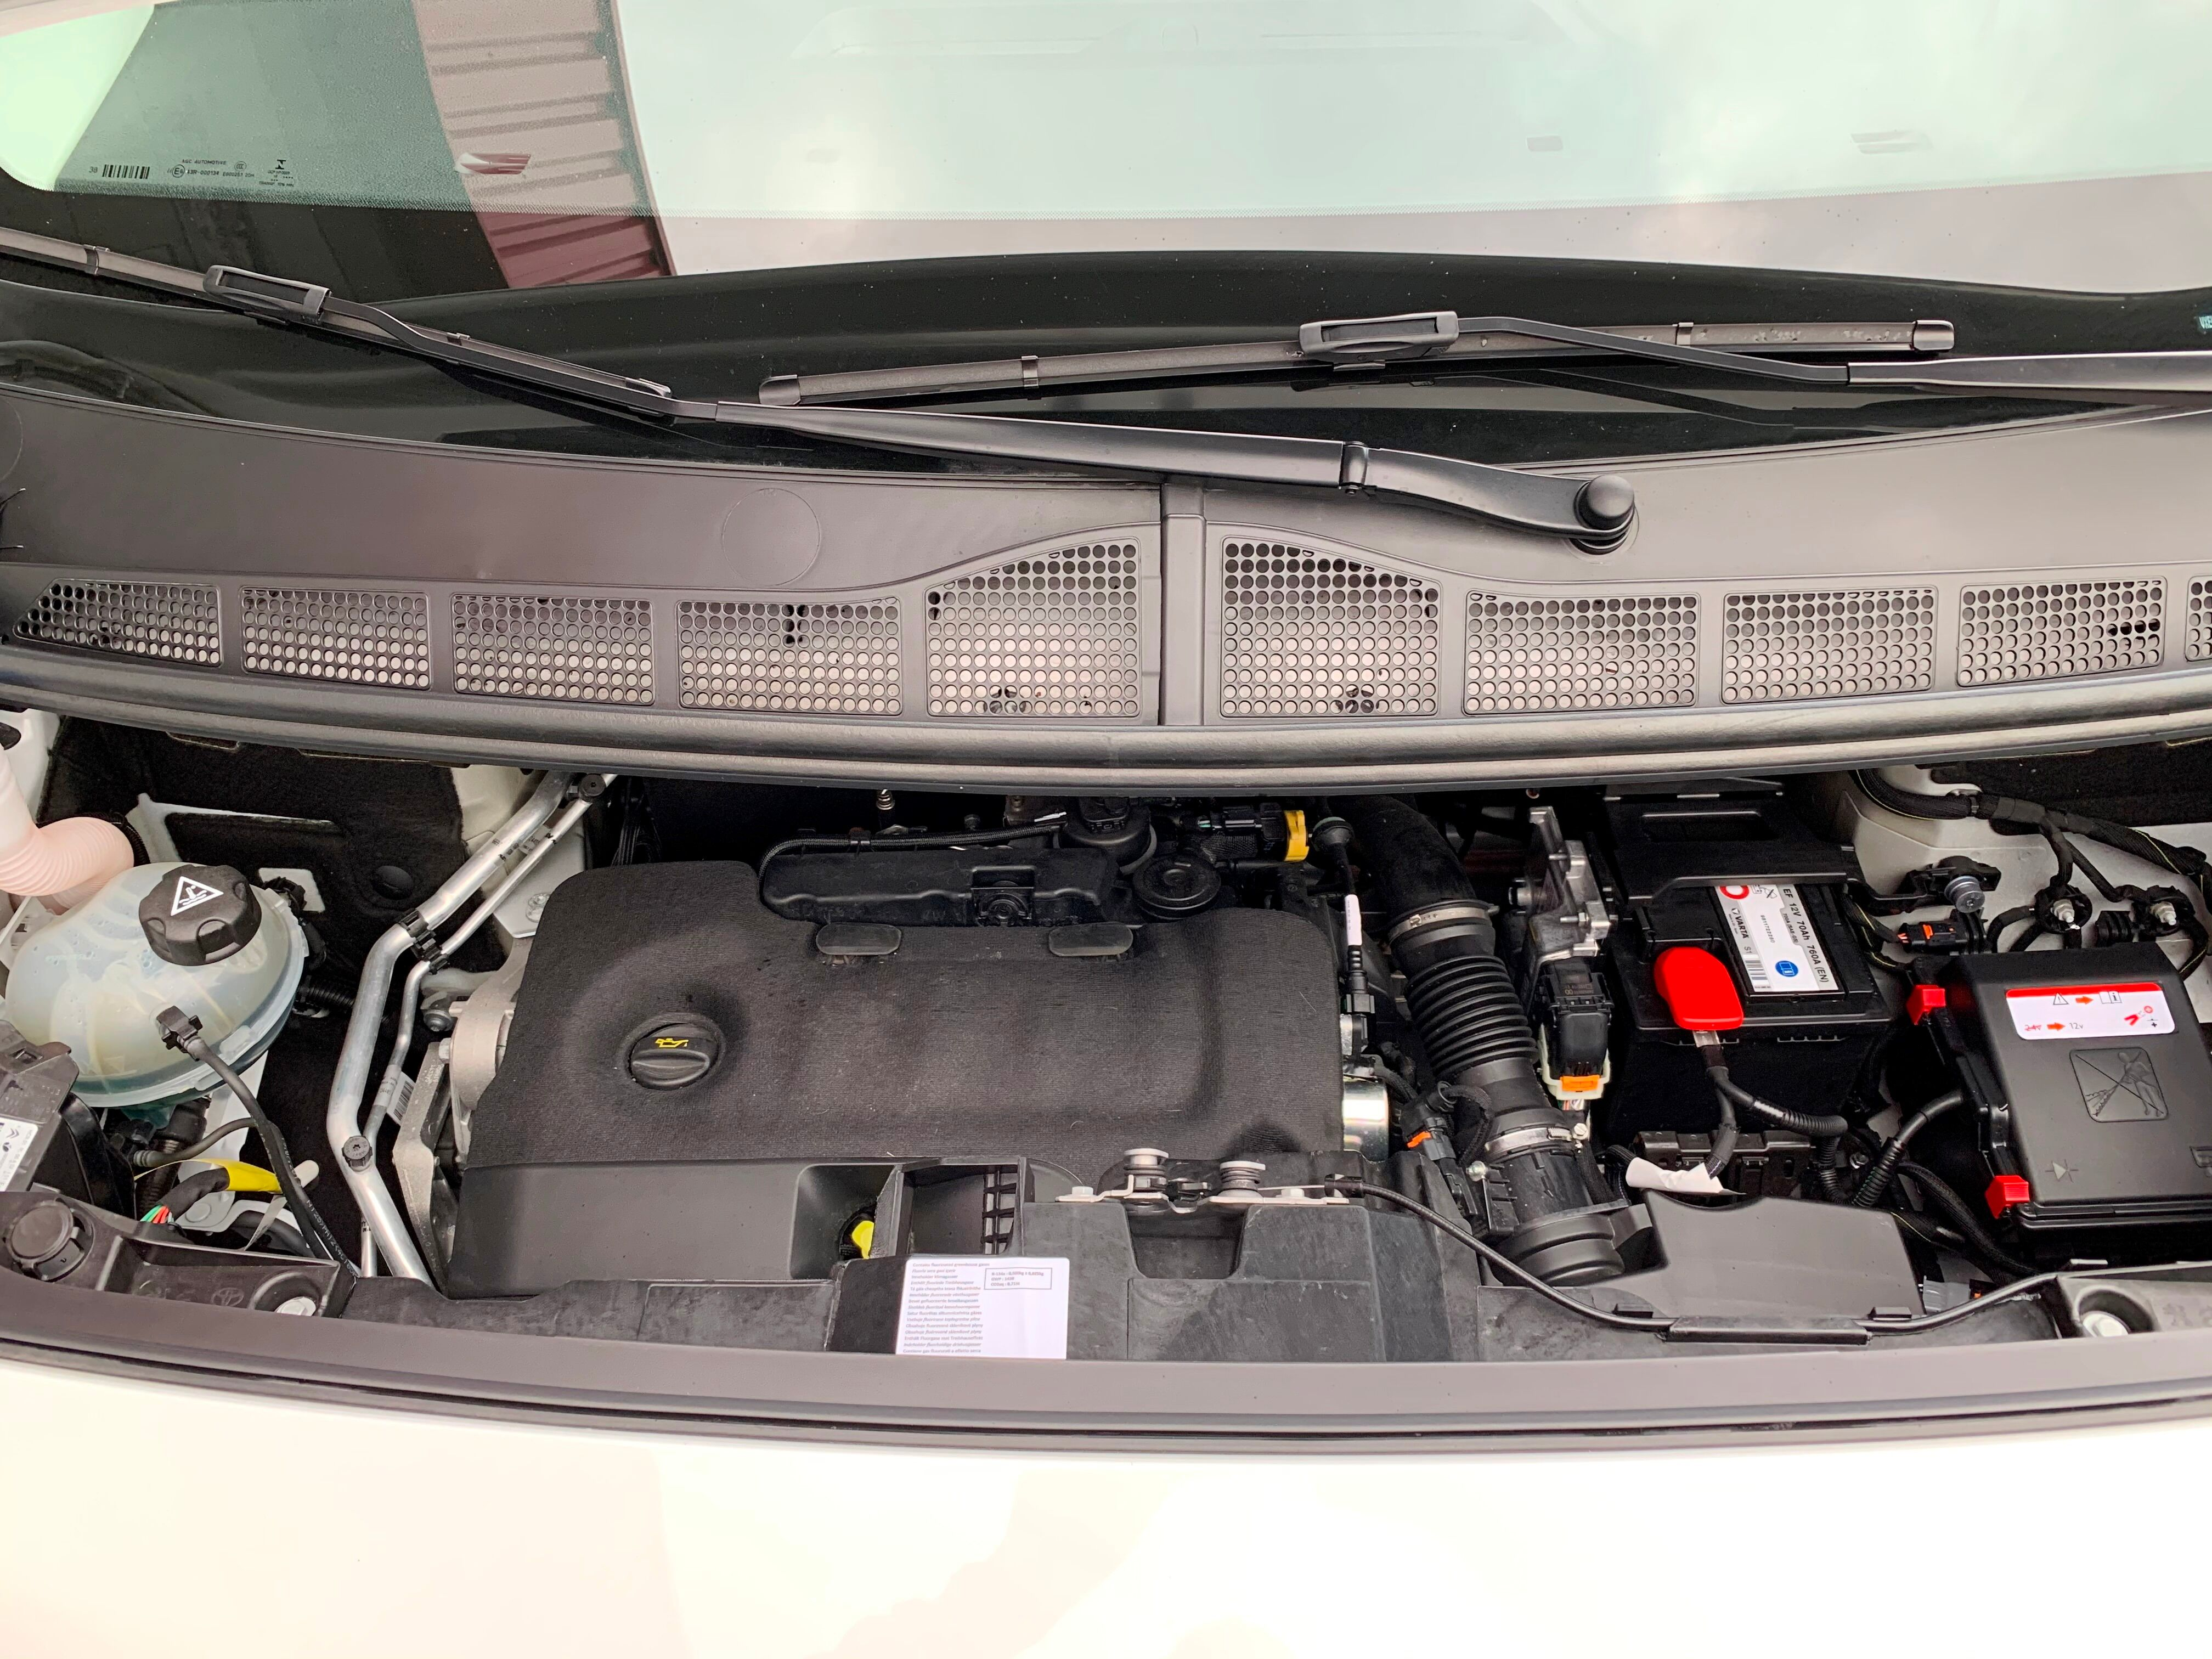 Opel Vivaro 2.0D 122PK Edition L3H1 NIEUW in stock 35% korting 27/29